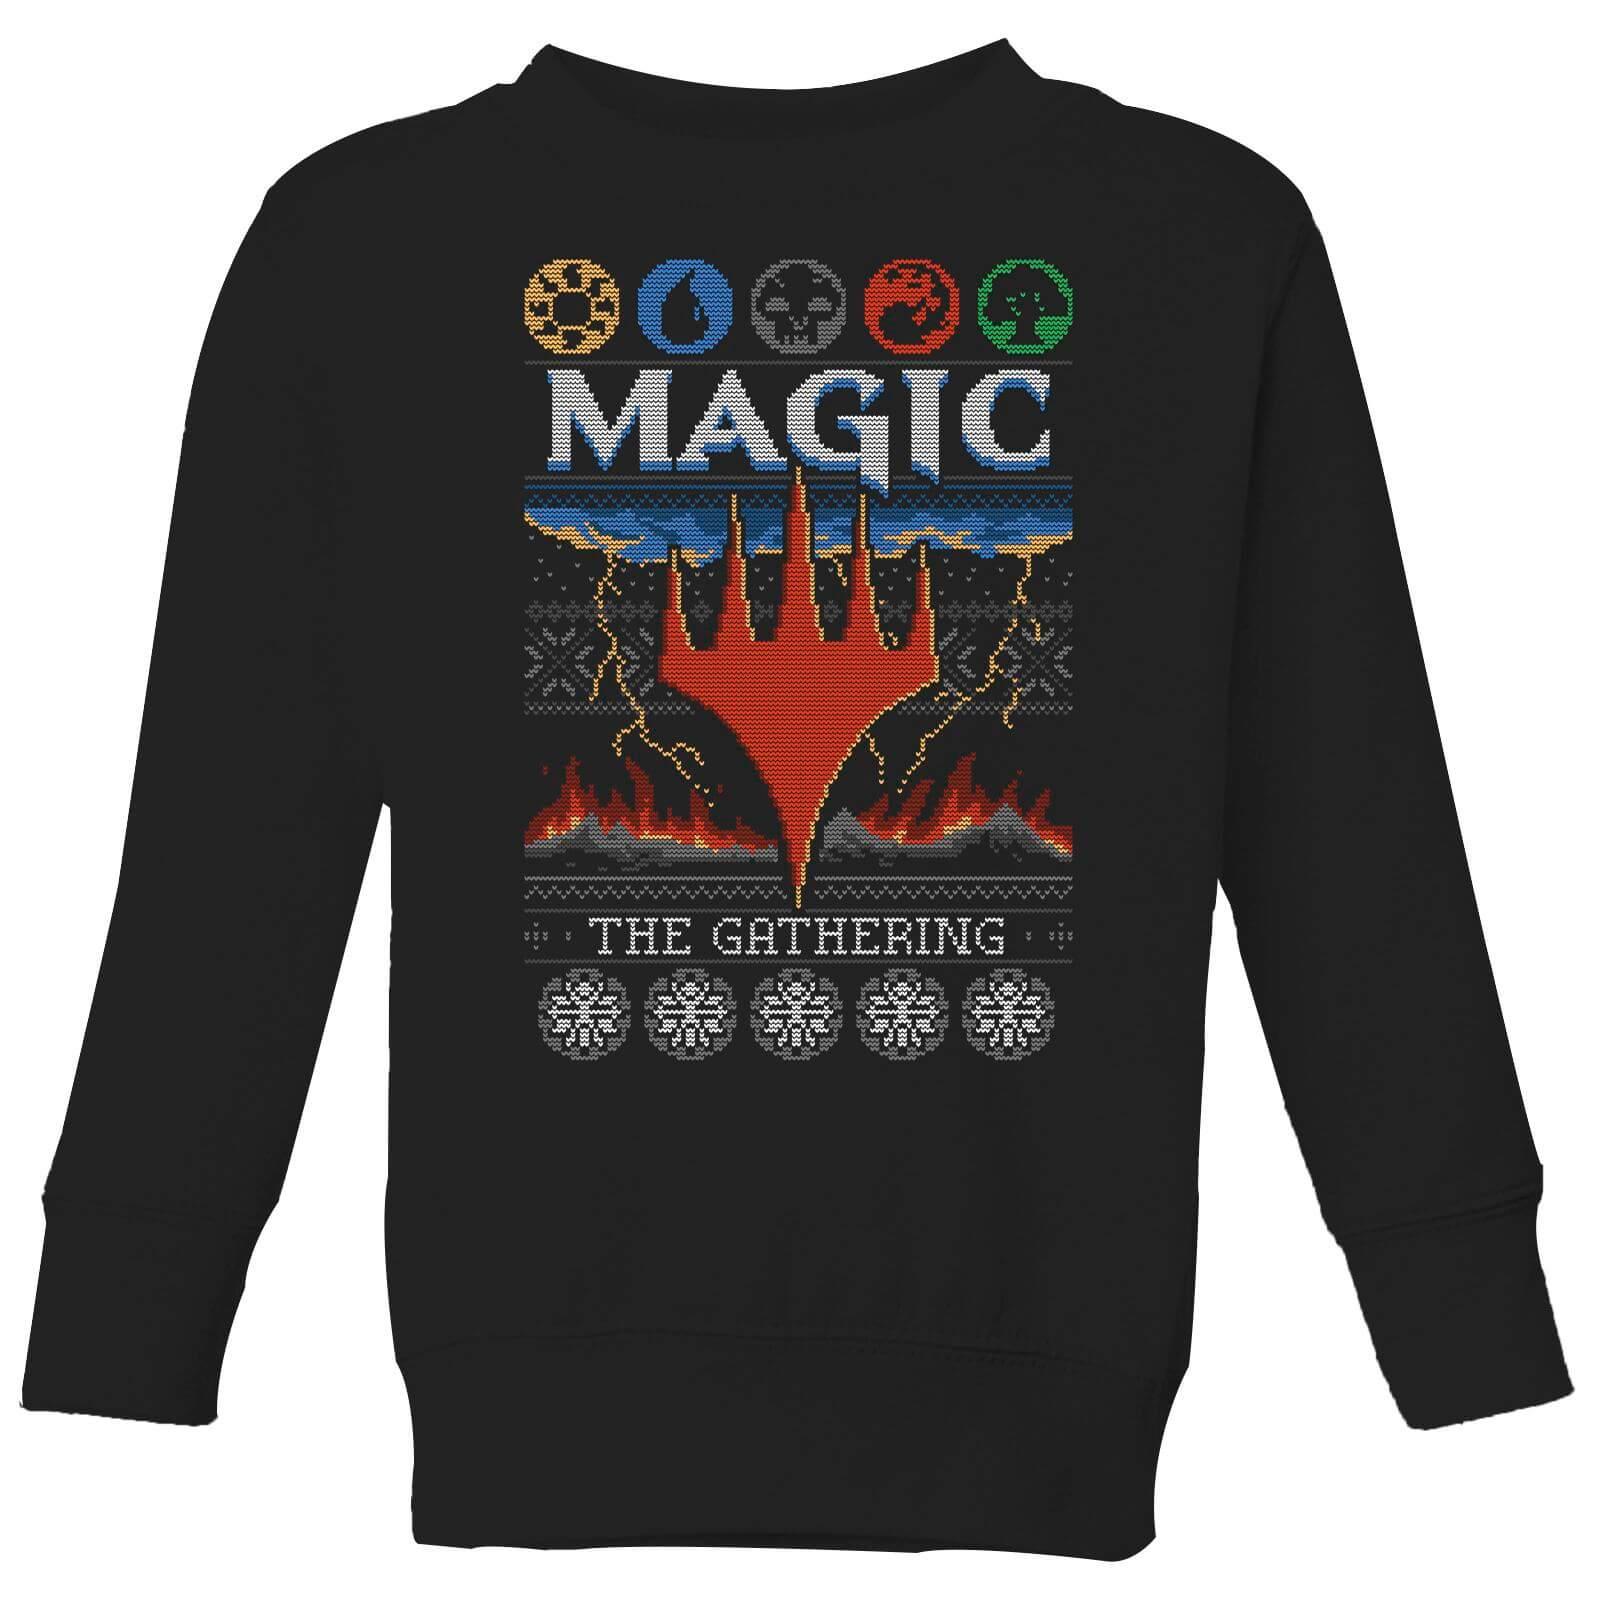 Black Sabbath Christmas Sweater.Magic The Gathering Colours Of Magic Knit Kids Christmas Sweatshirt Black